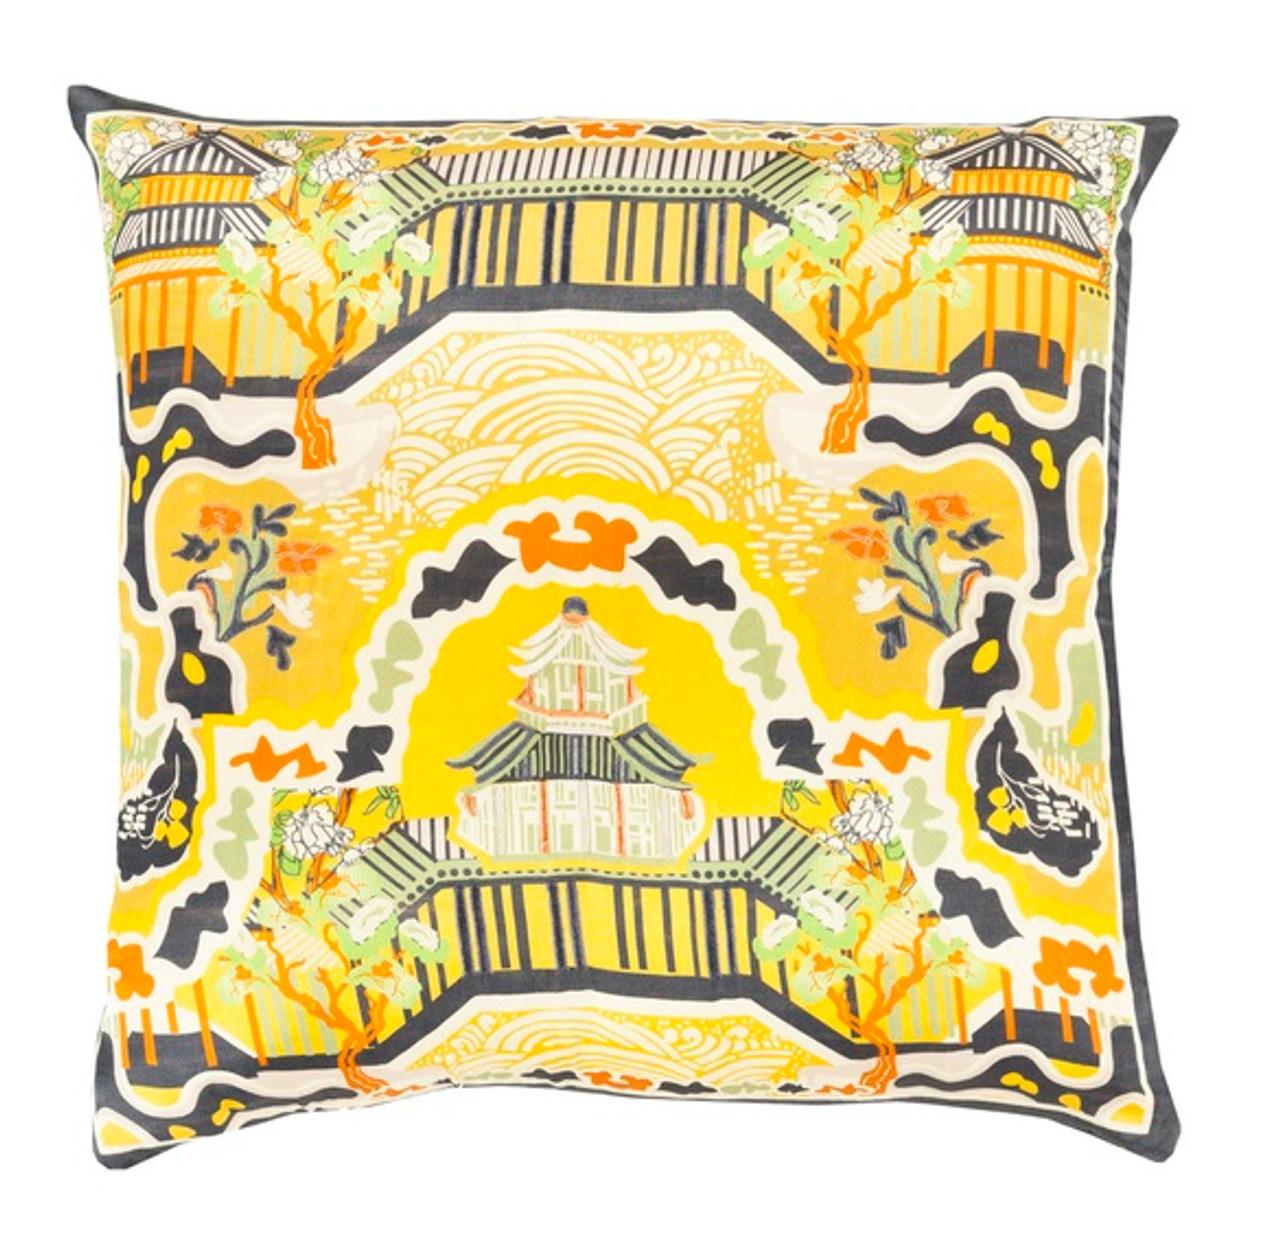 22 dream castle butterscotch yellow orange and black decorative square throw pillow down